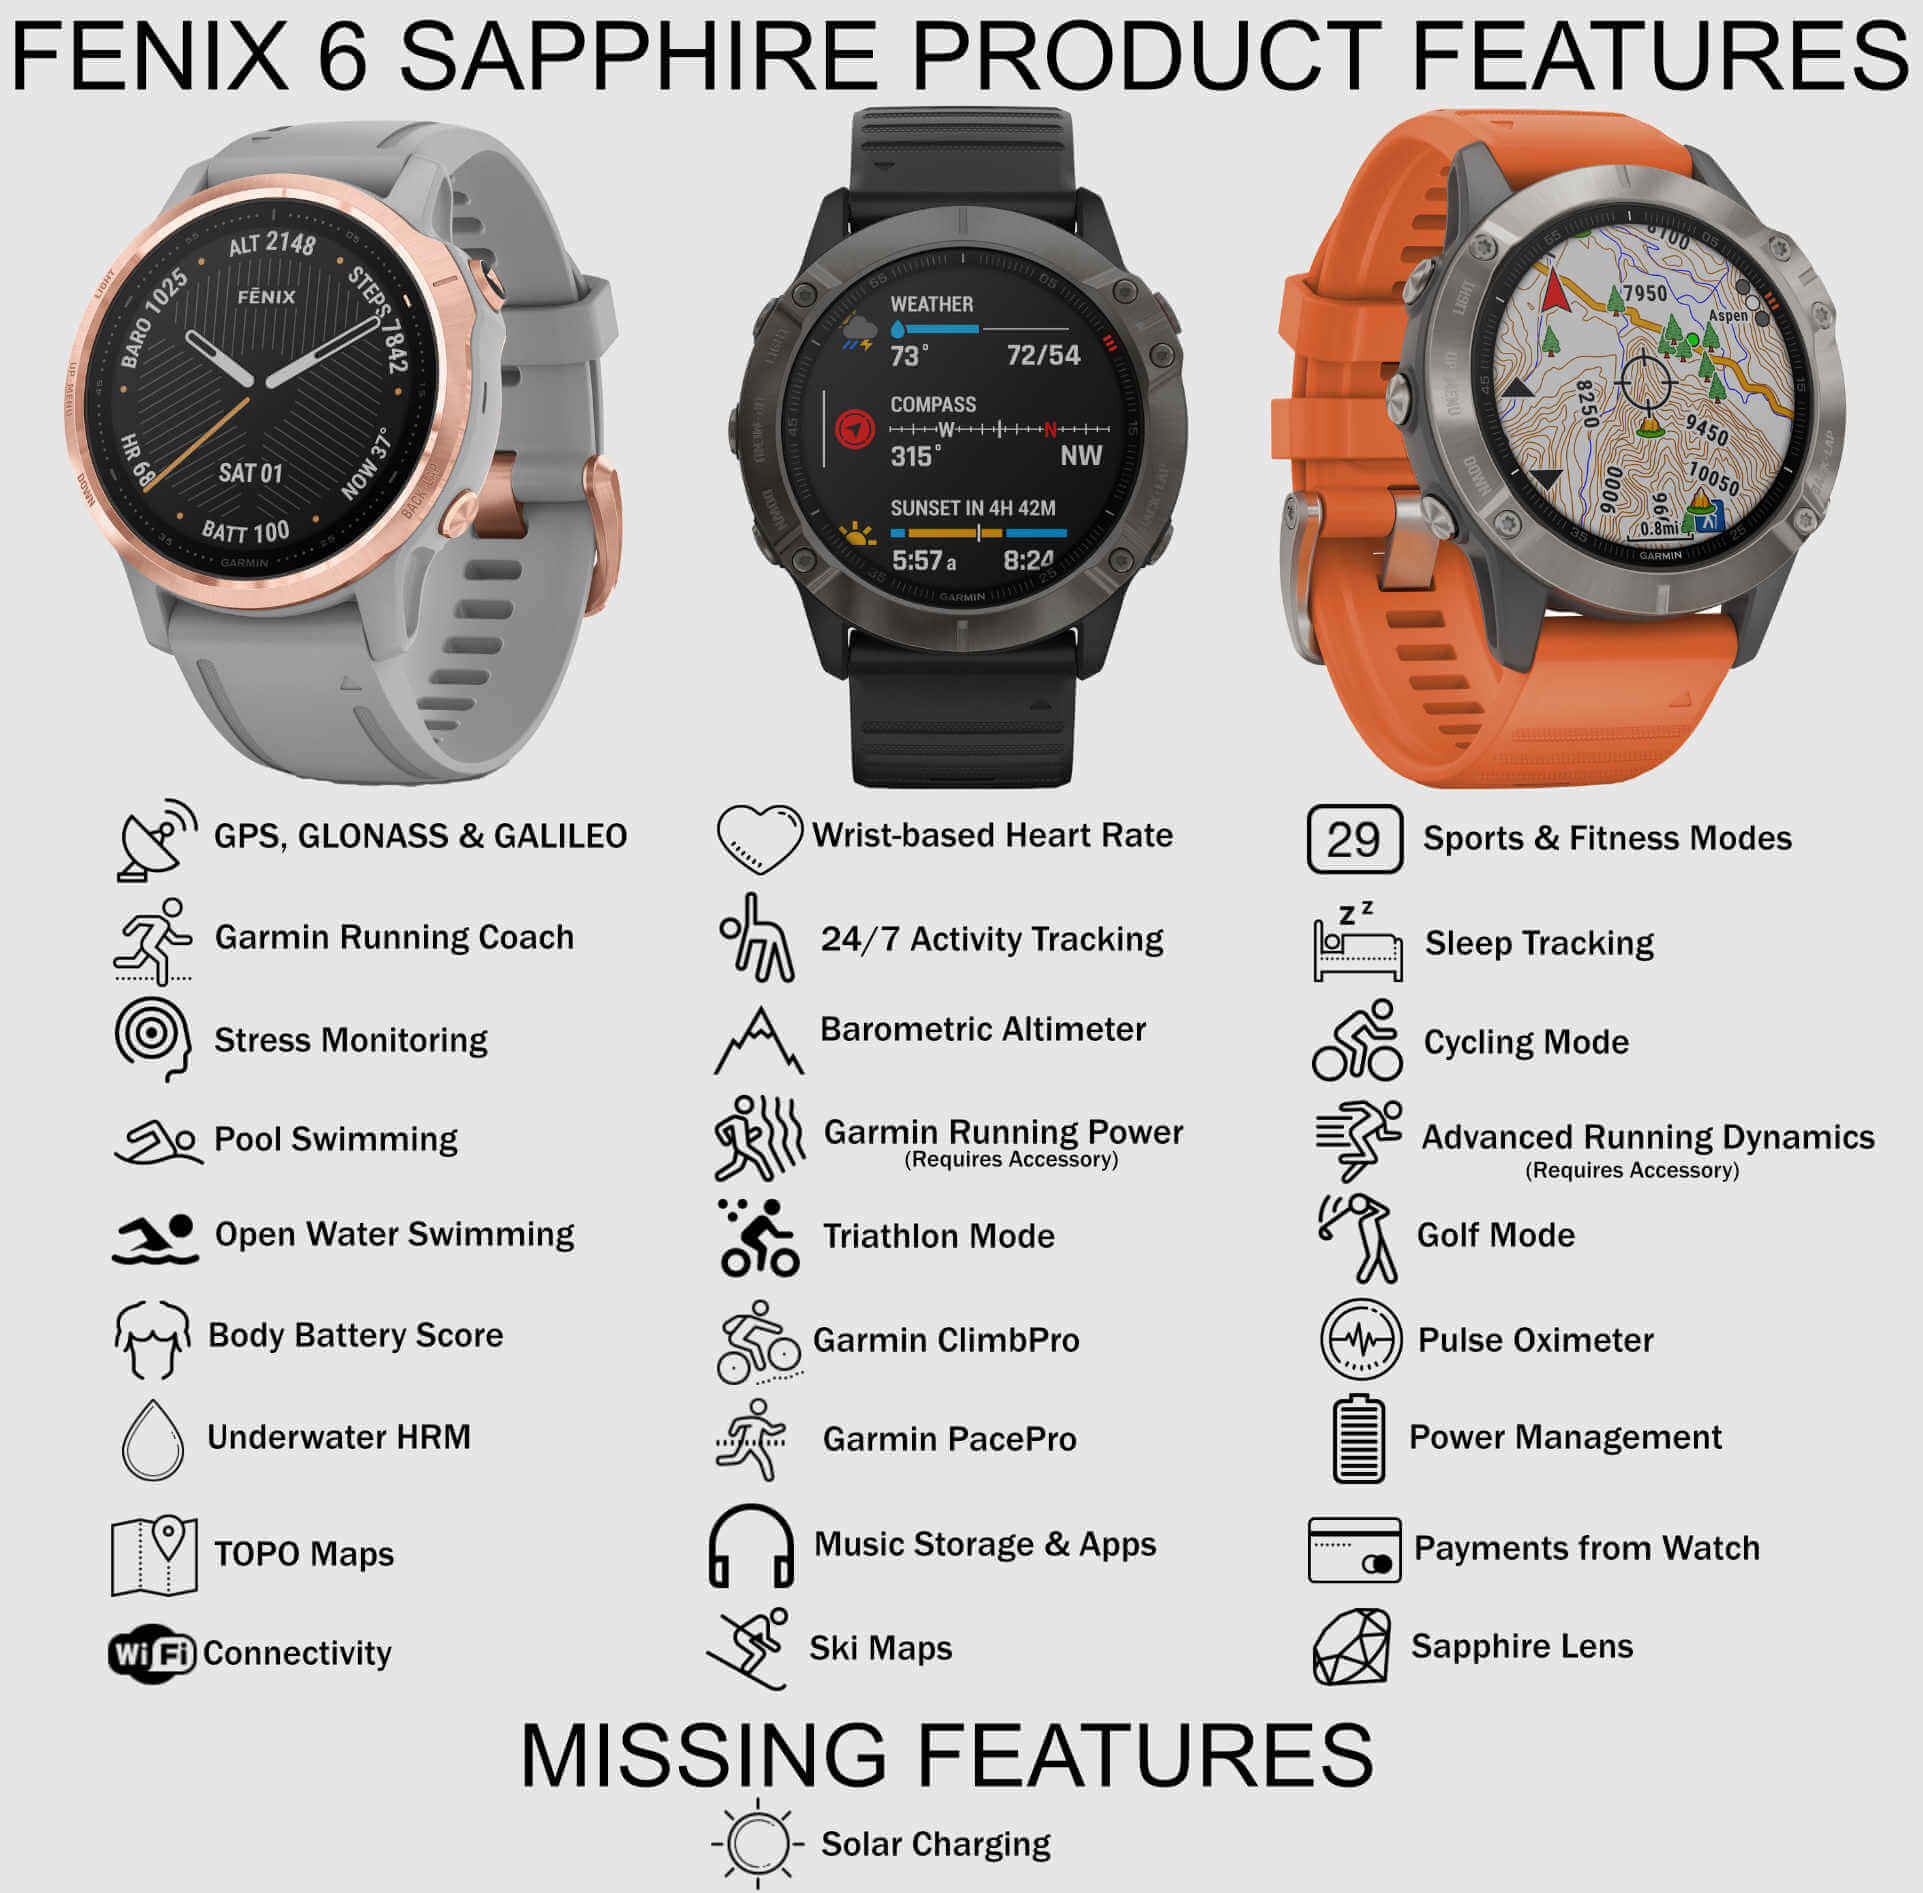 Fenix 6 Sapphire Comparison Chart